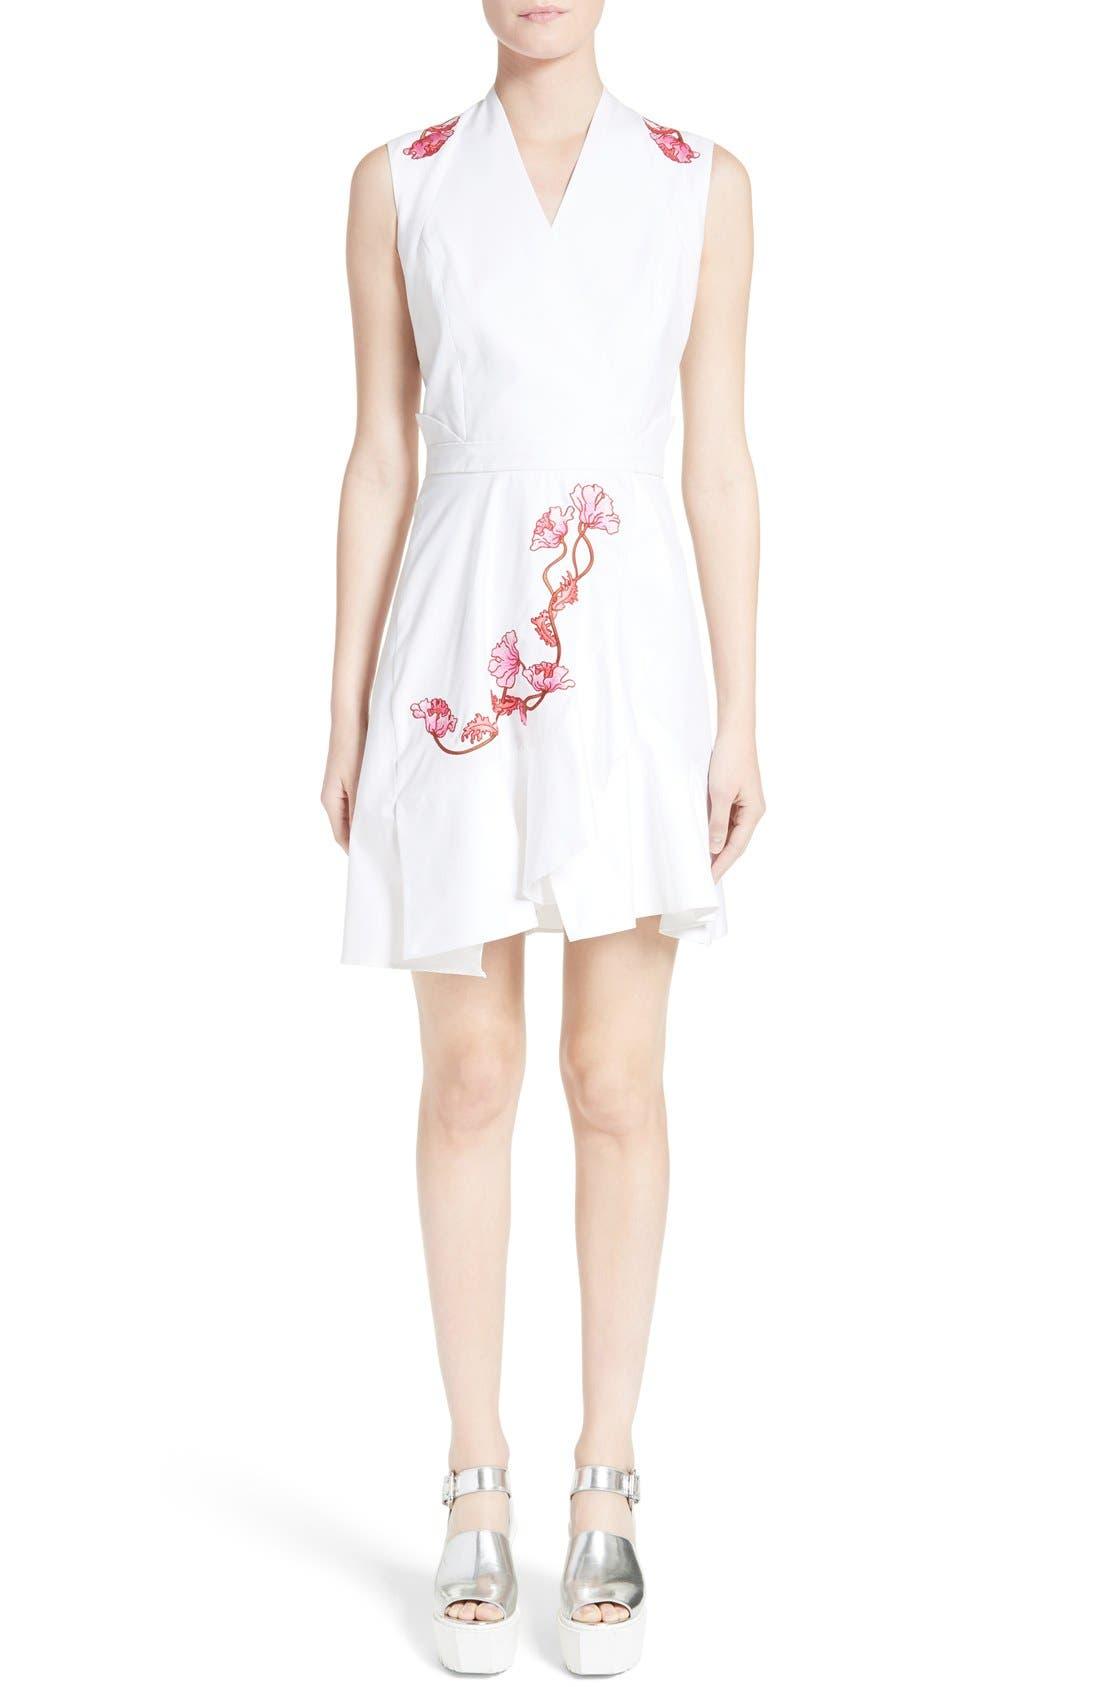 Alternate Image 1 Selected - Carven Embroidered Dress